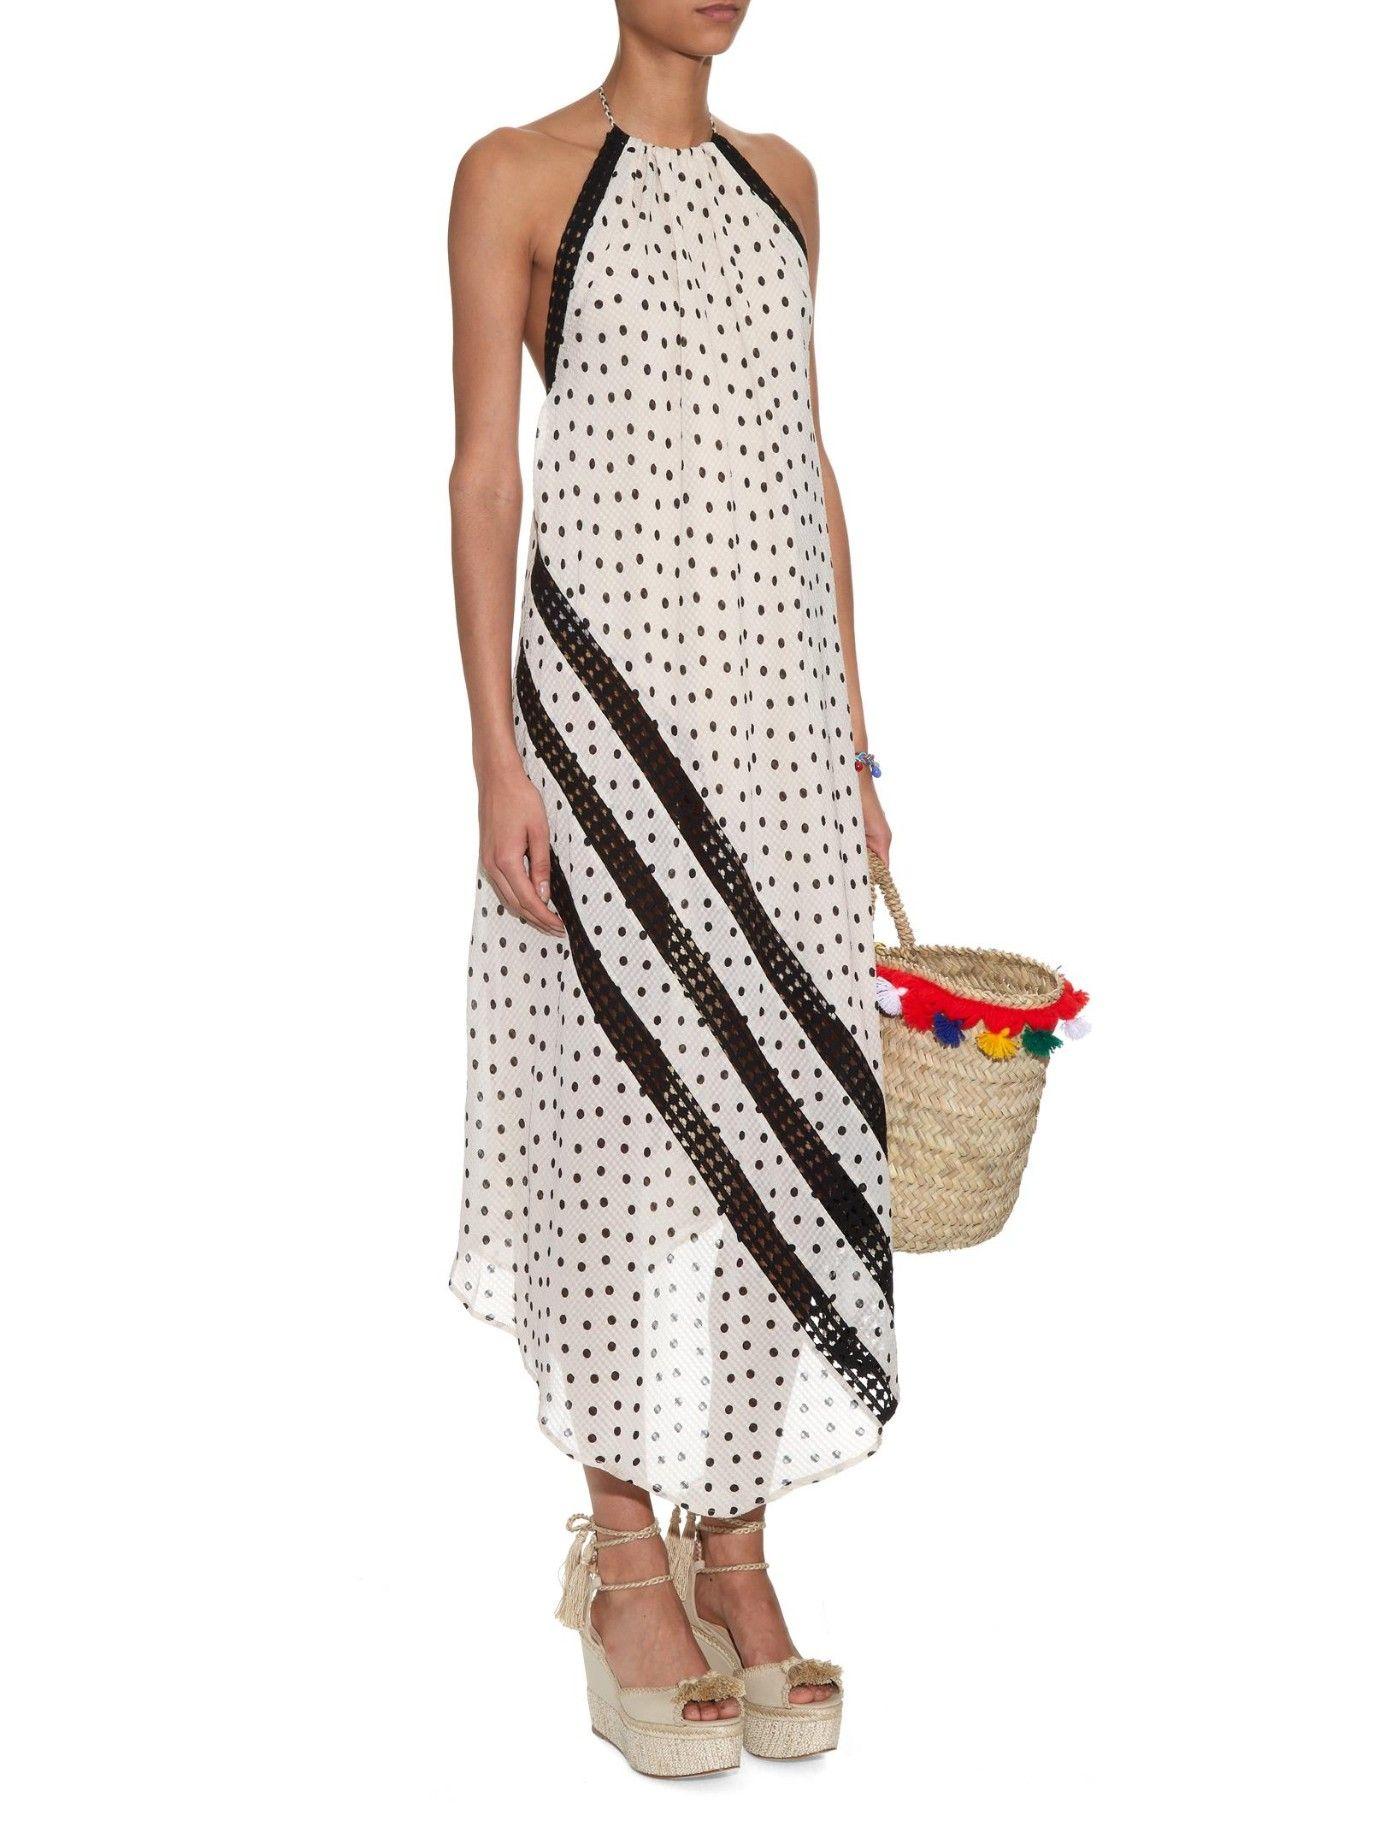 5db40d72167b45 Positano Melanie halterneck dress